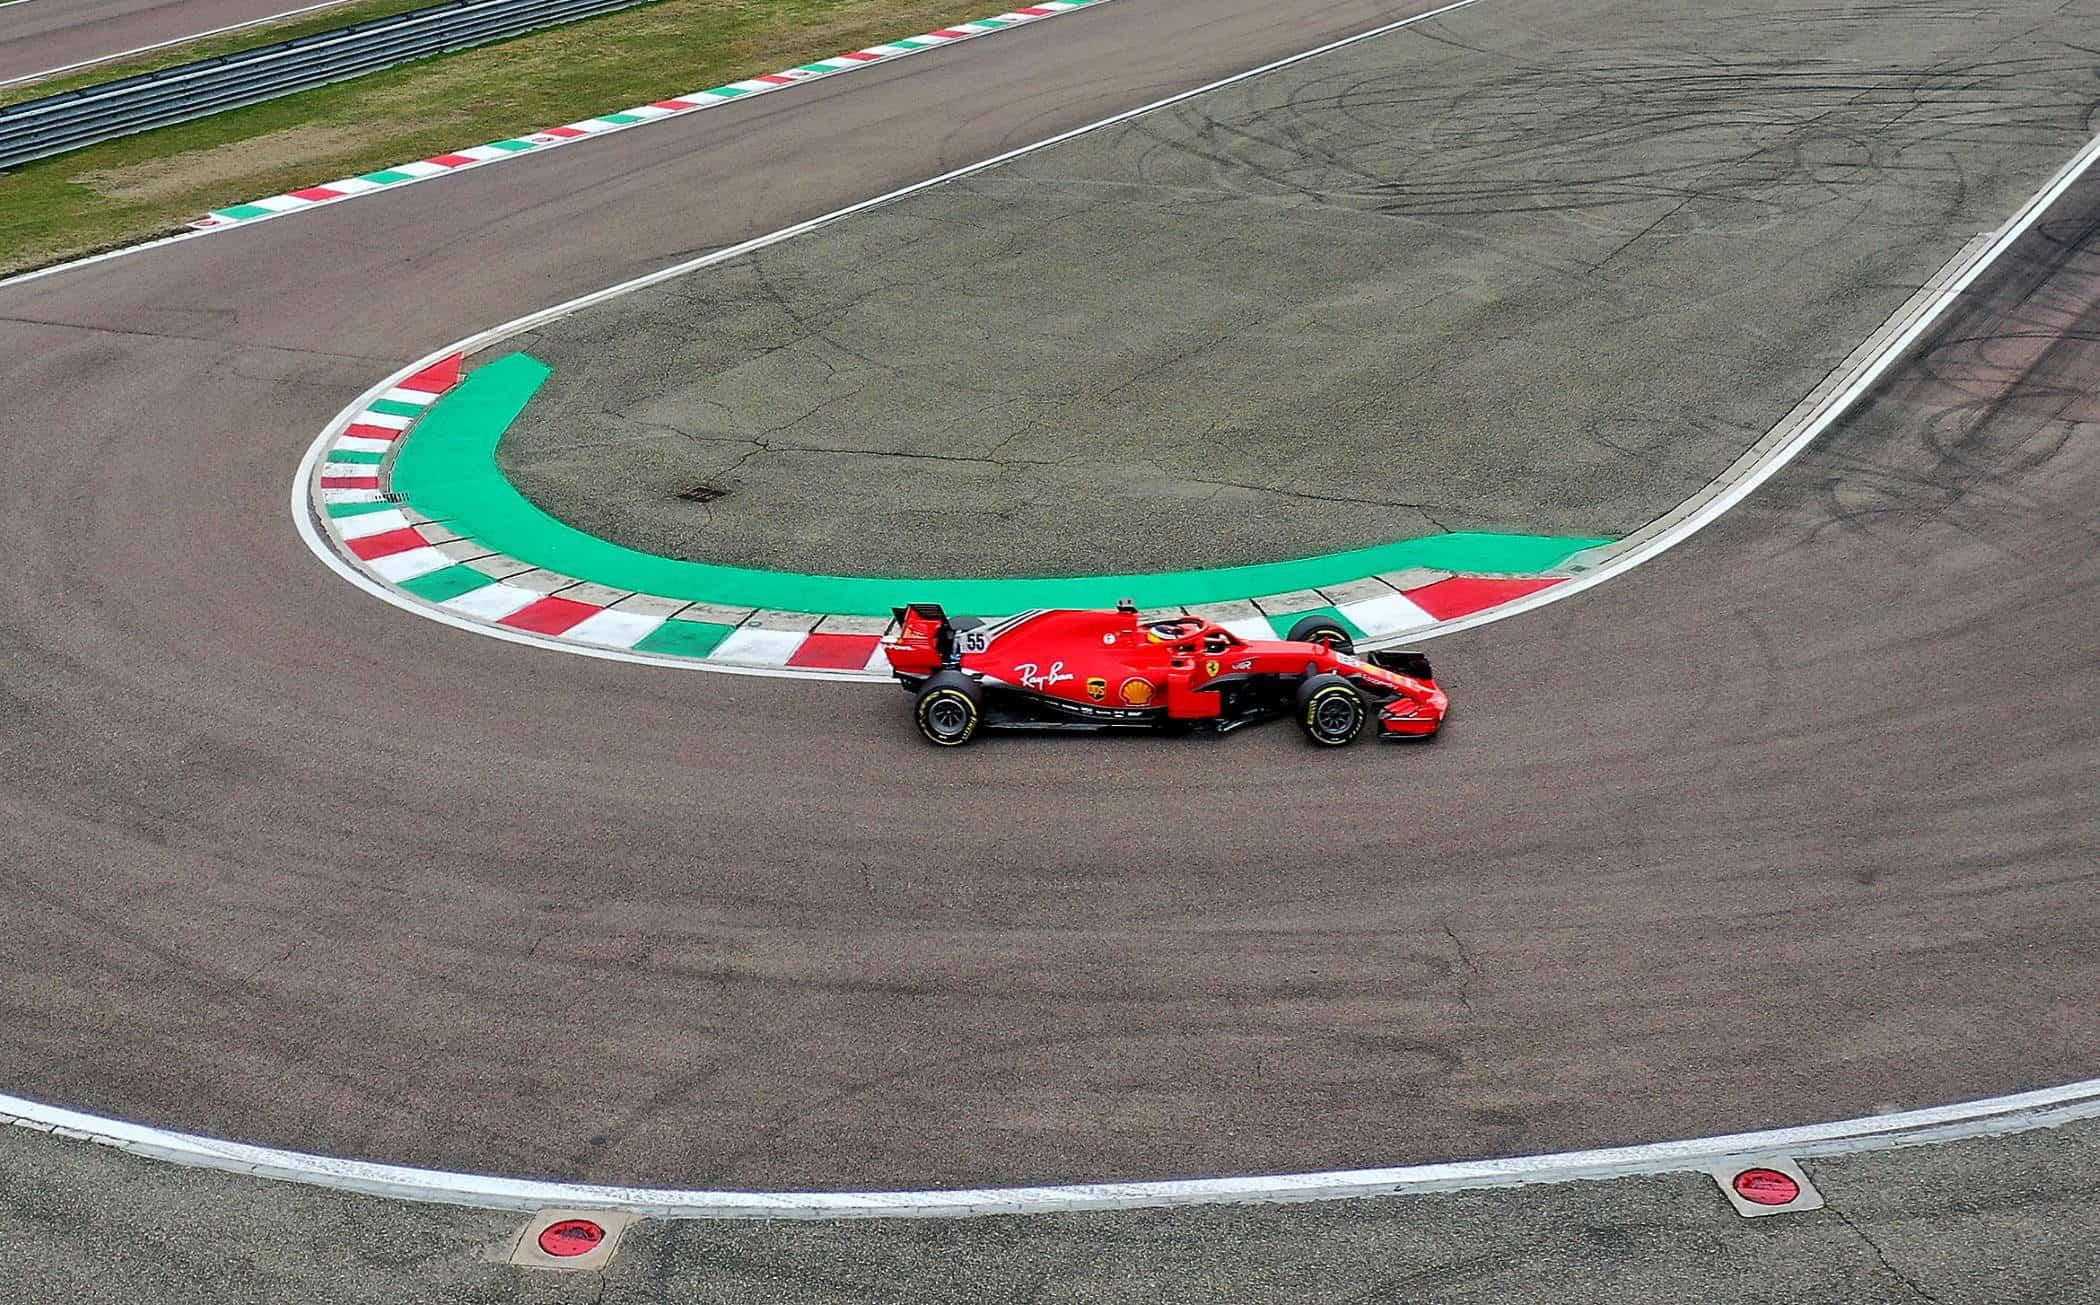 2021 Fiorano Carlos Sainz first Ferrari test on track hairpin Fiorano Ferrari SF71H 2018 on Wed 27 Jan 2021 Photo Ferrari